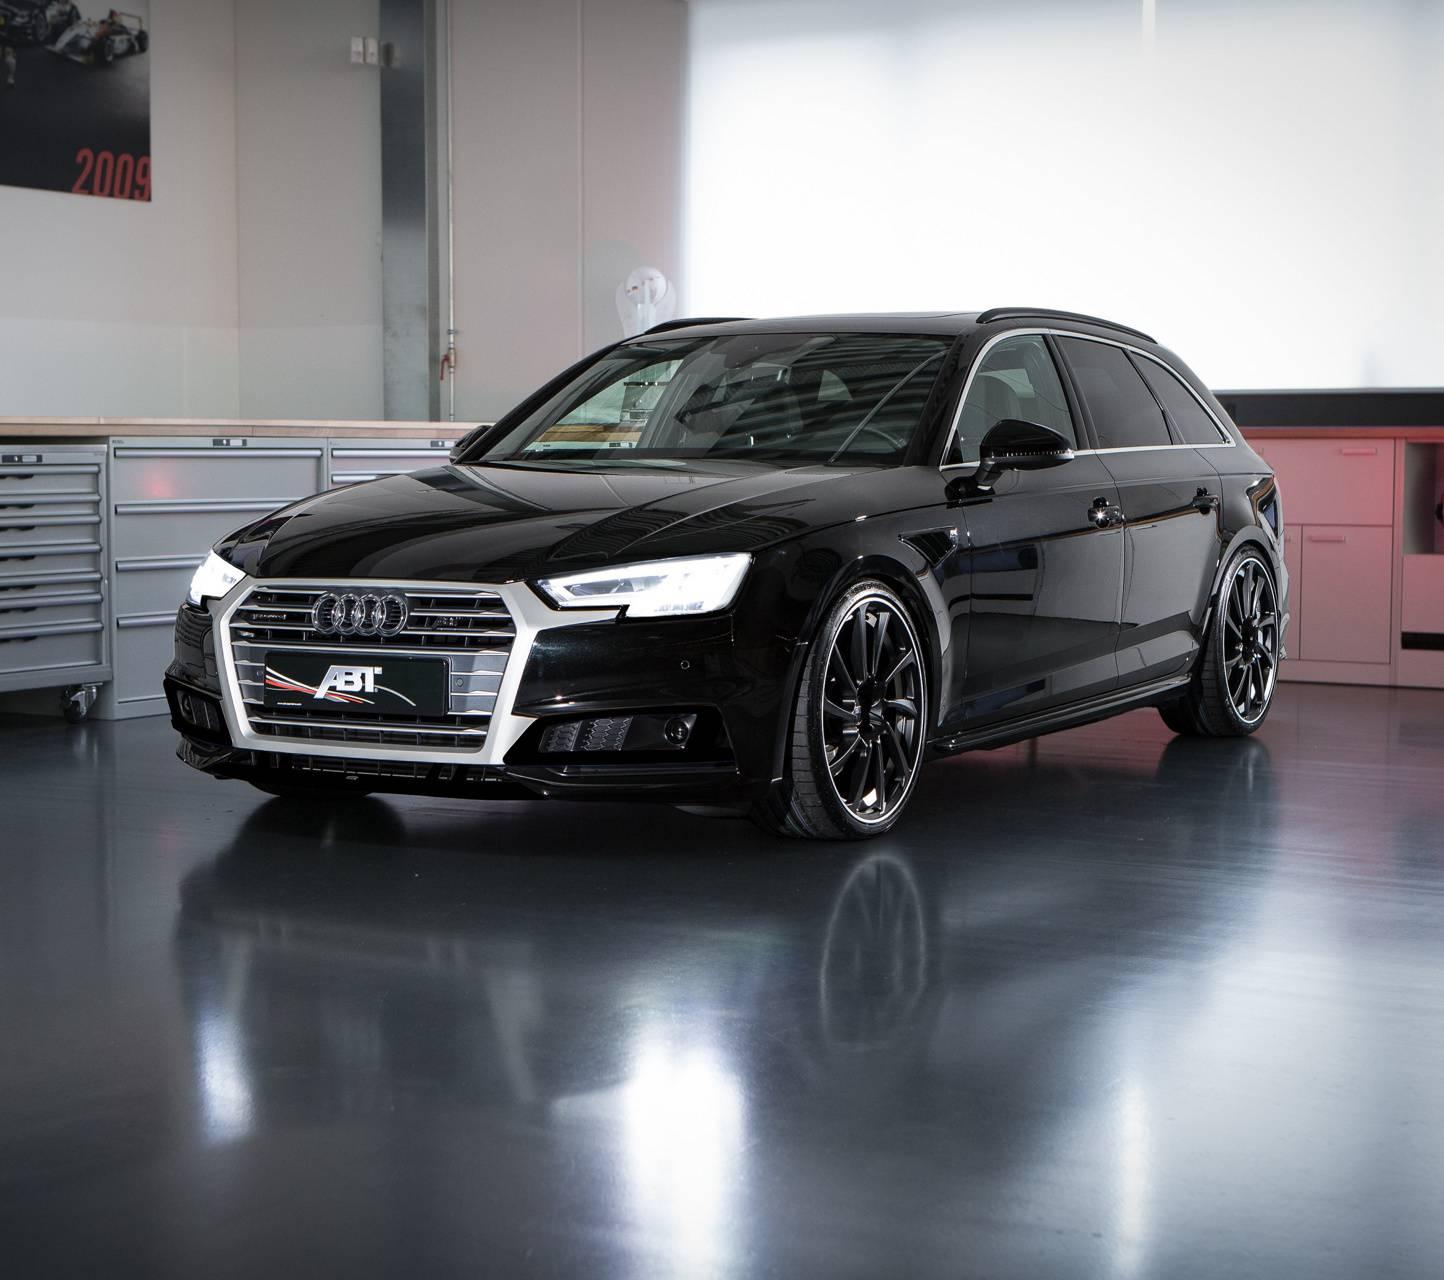 Tuned Audi